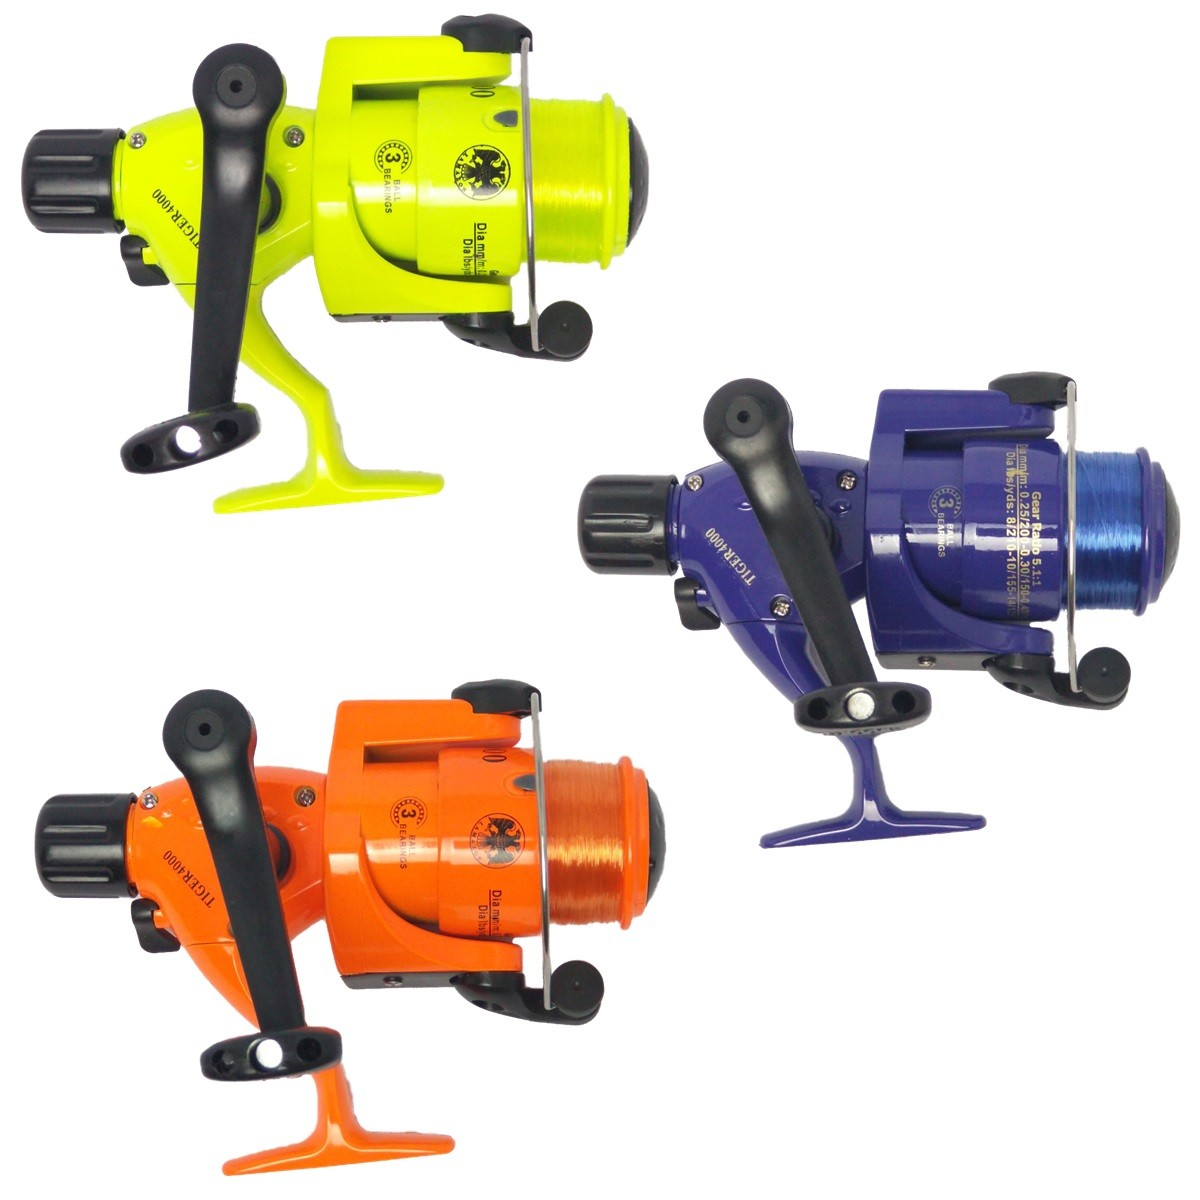 Kit Pesca 2 Vara 1,60 Telescopica 2 Molinete 4000 3 Rol Item